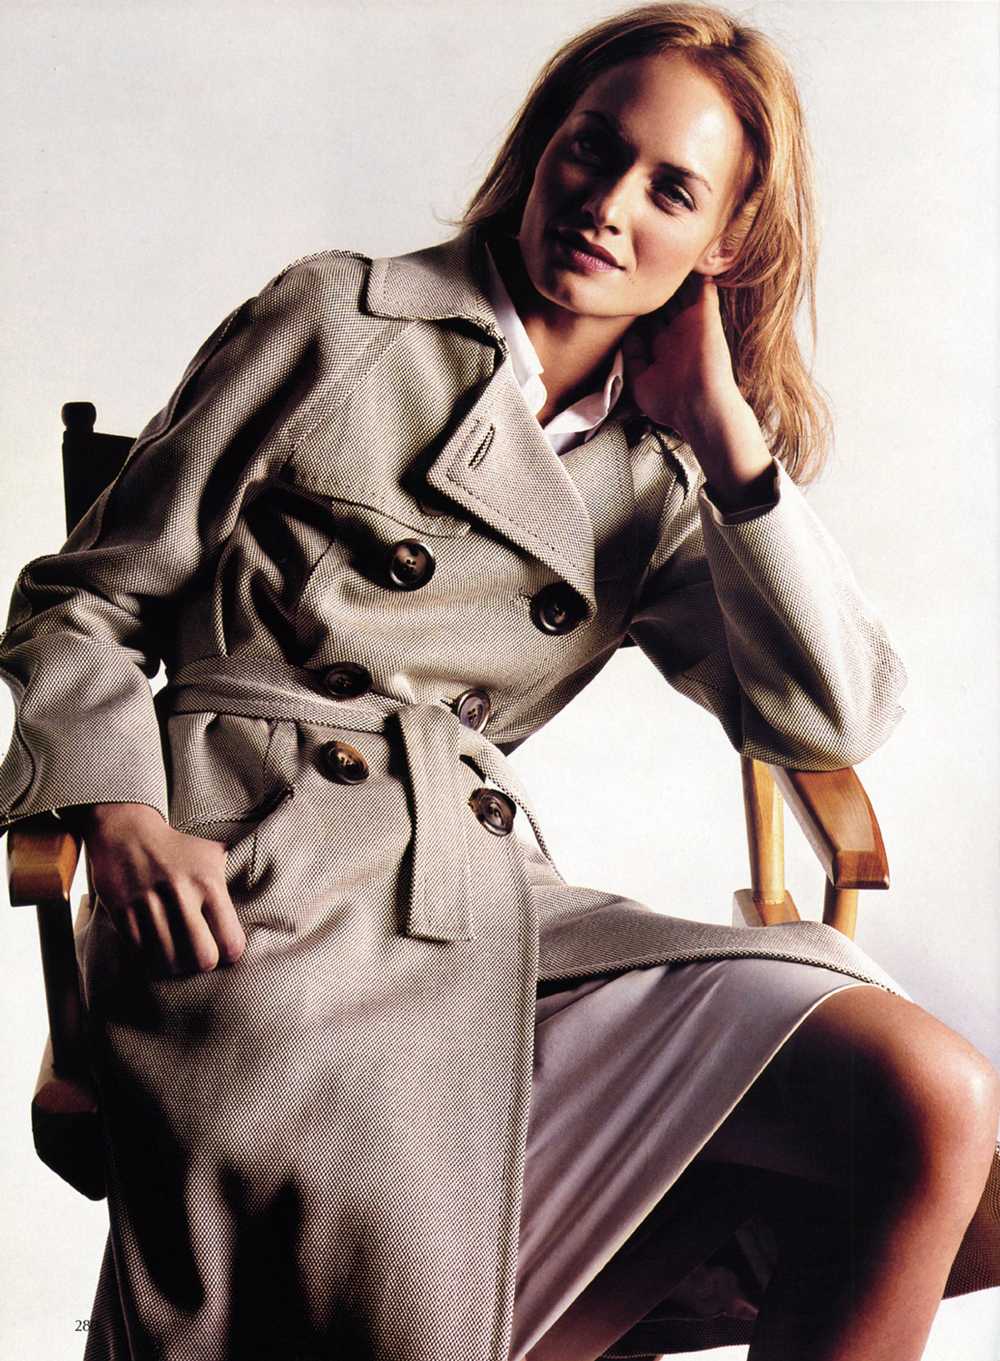 Vogue US February 2000 via www.fashionedbylove.co.uk